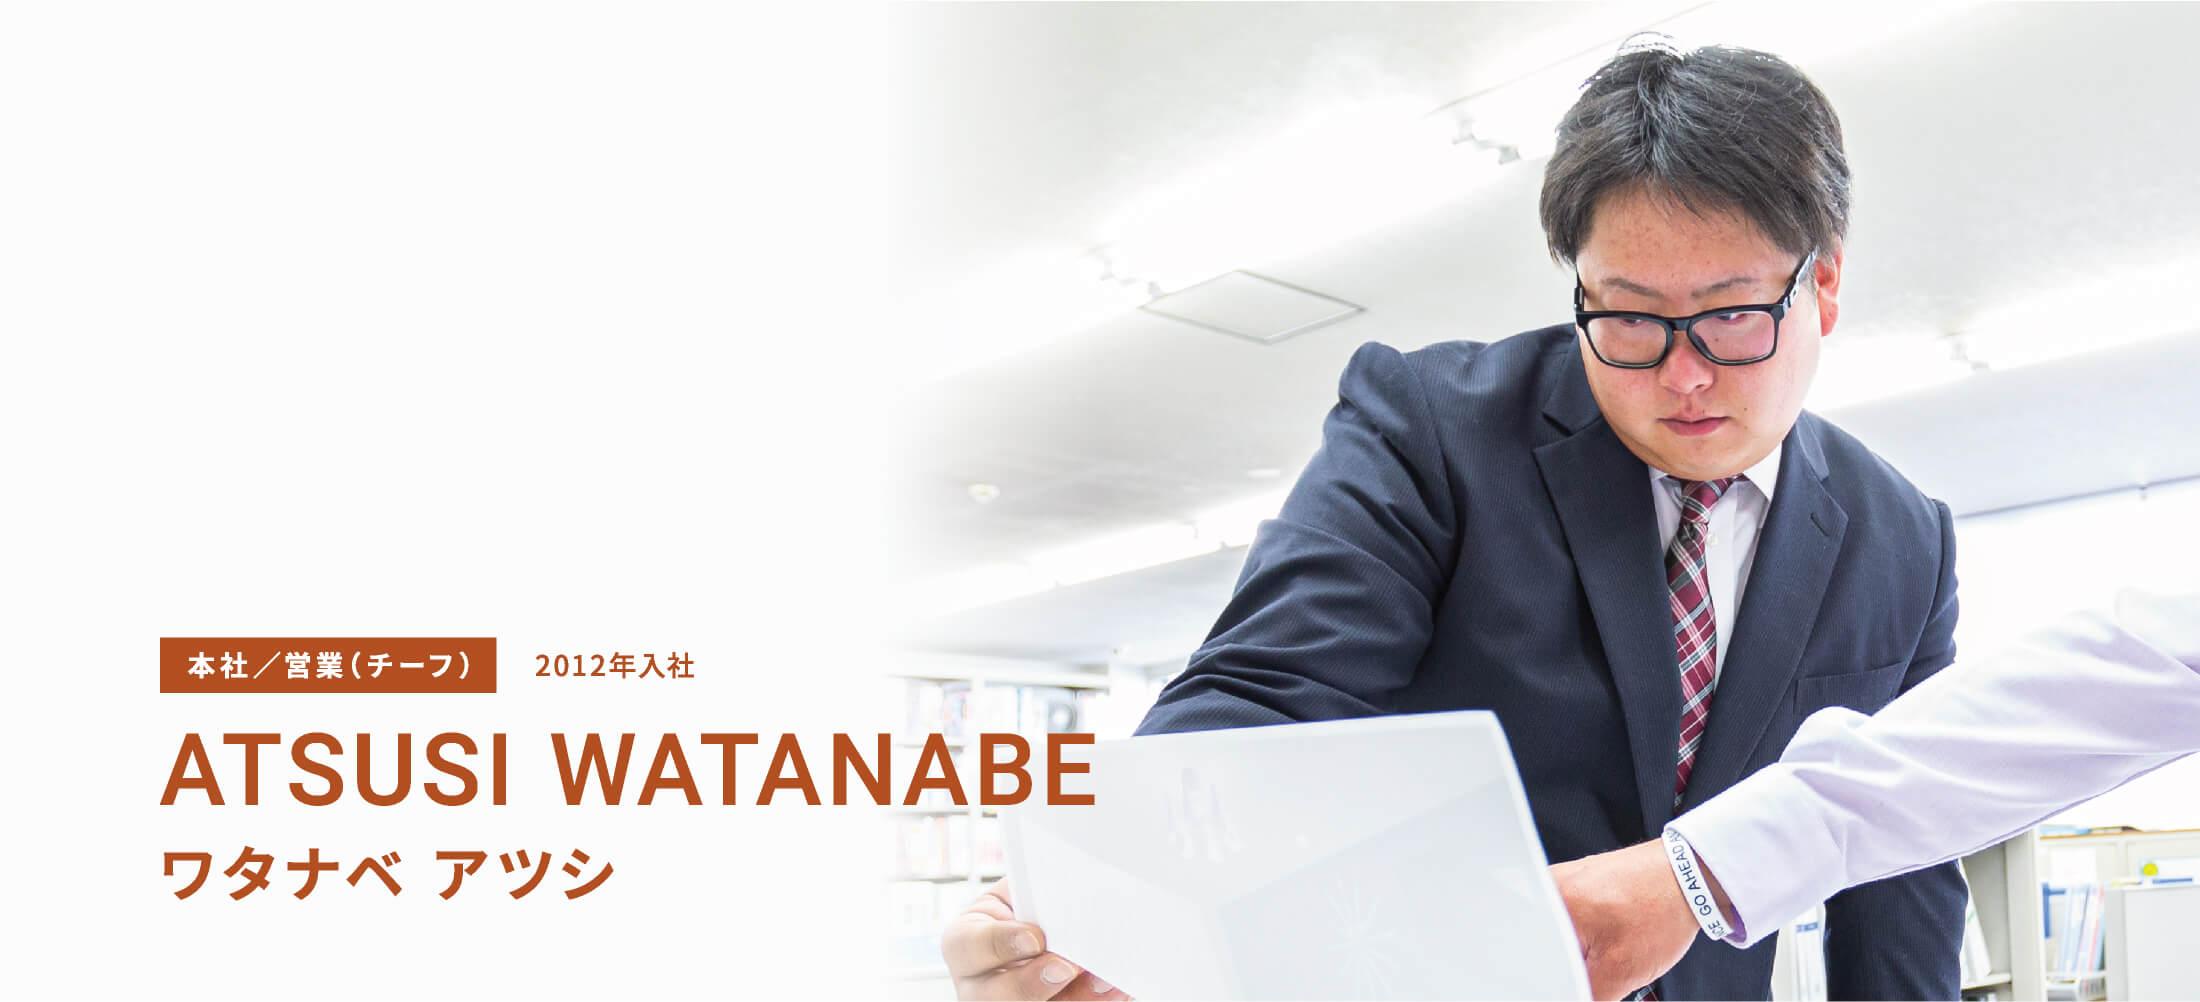 ATSUSI WATANABE ワタナベ アツシ